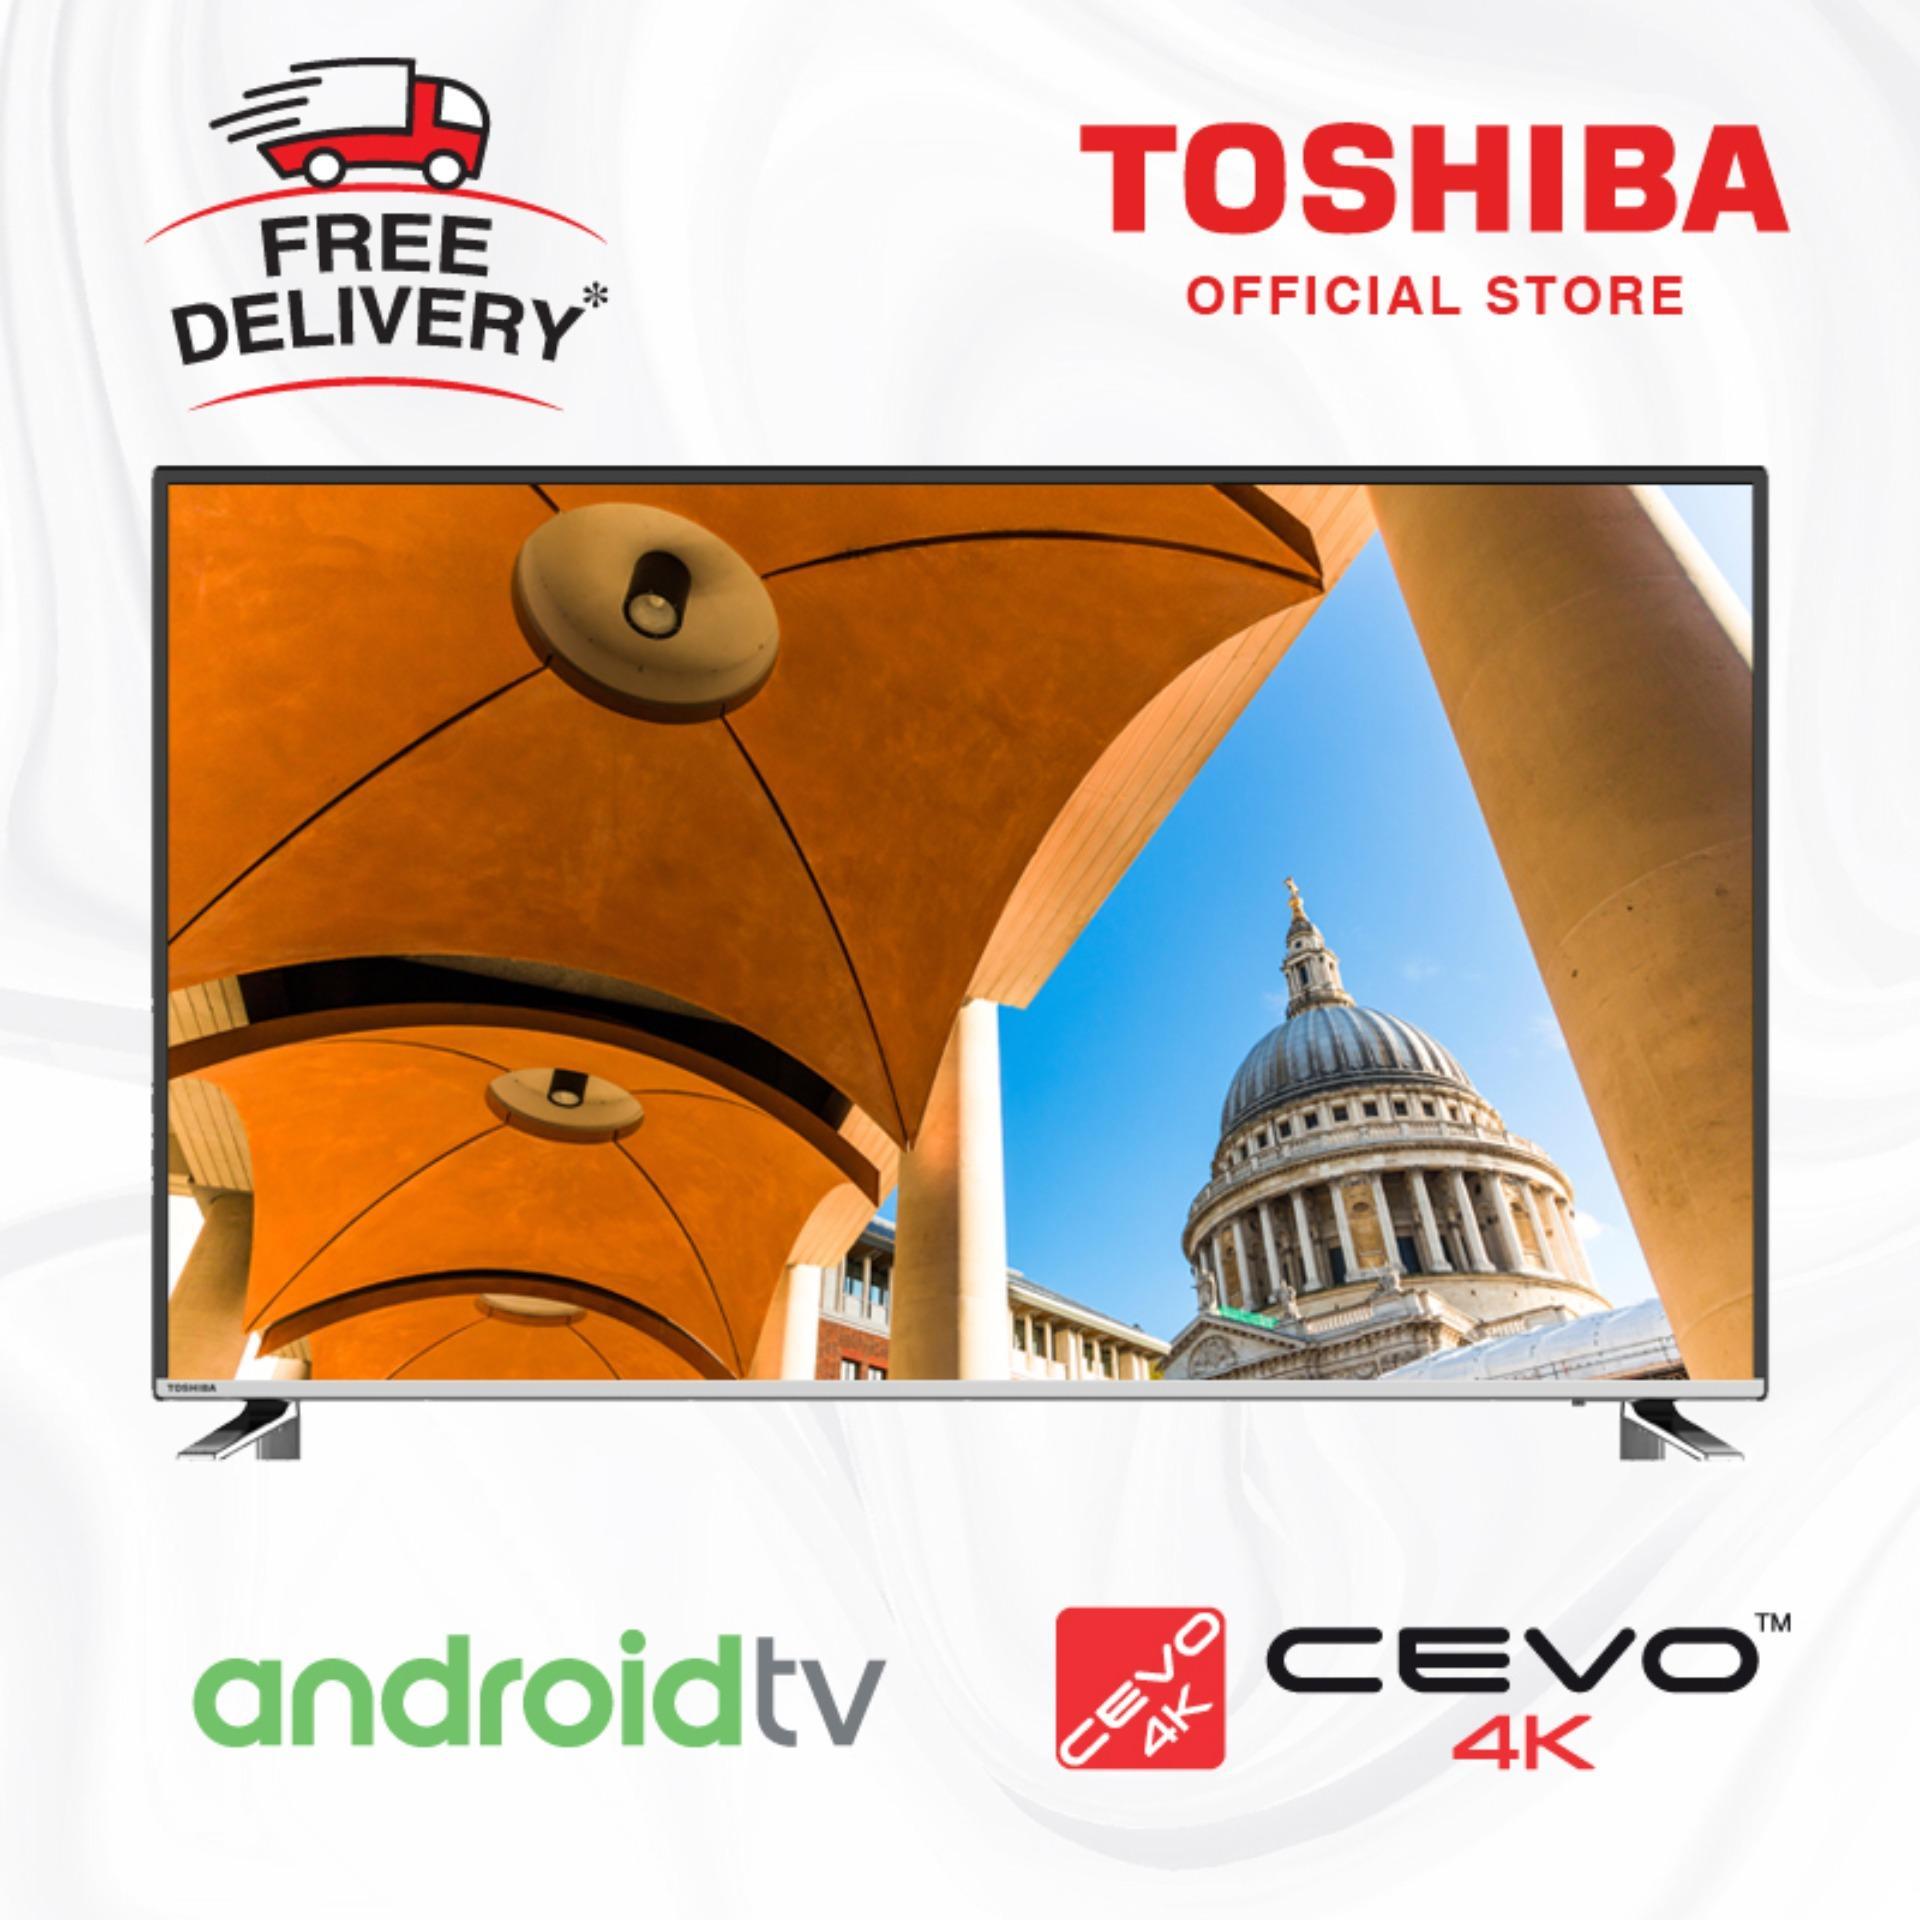 TOSHIBA 4K UHD ANDROID TV 50 Inch 50U7880